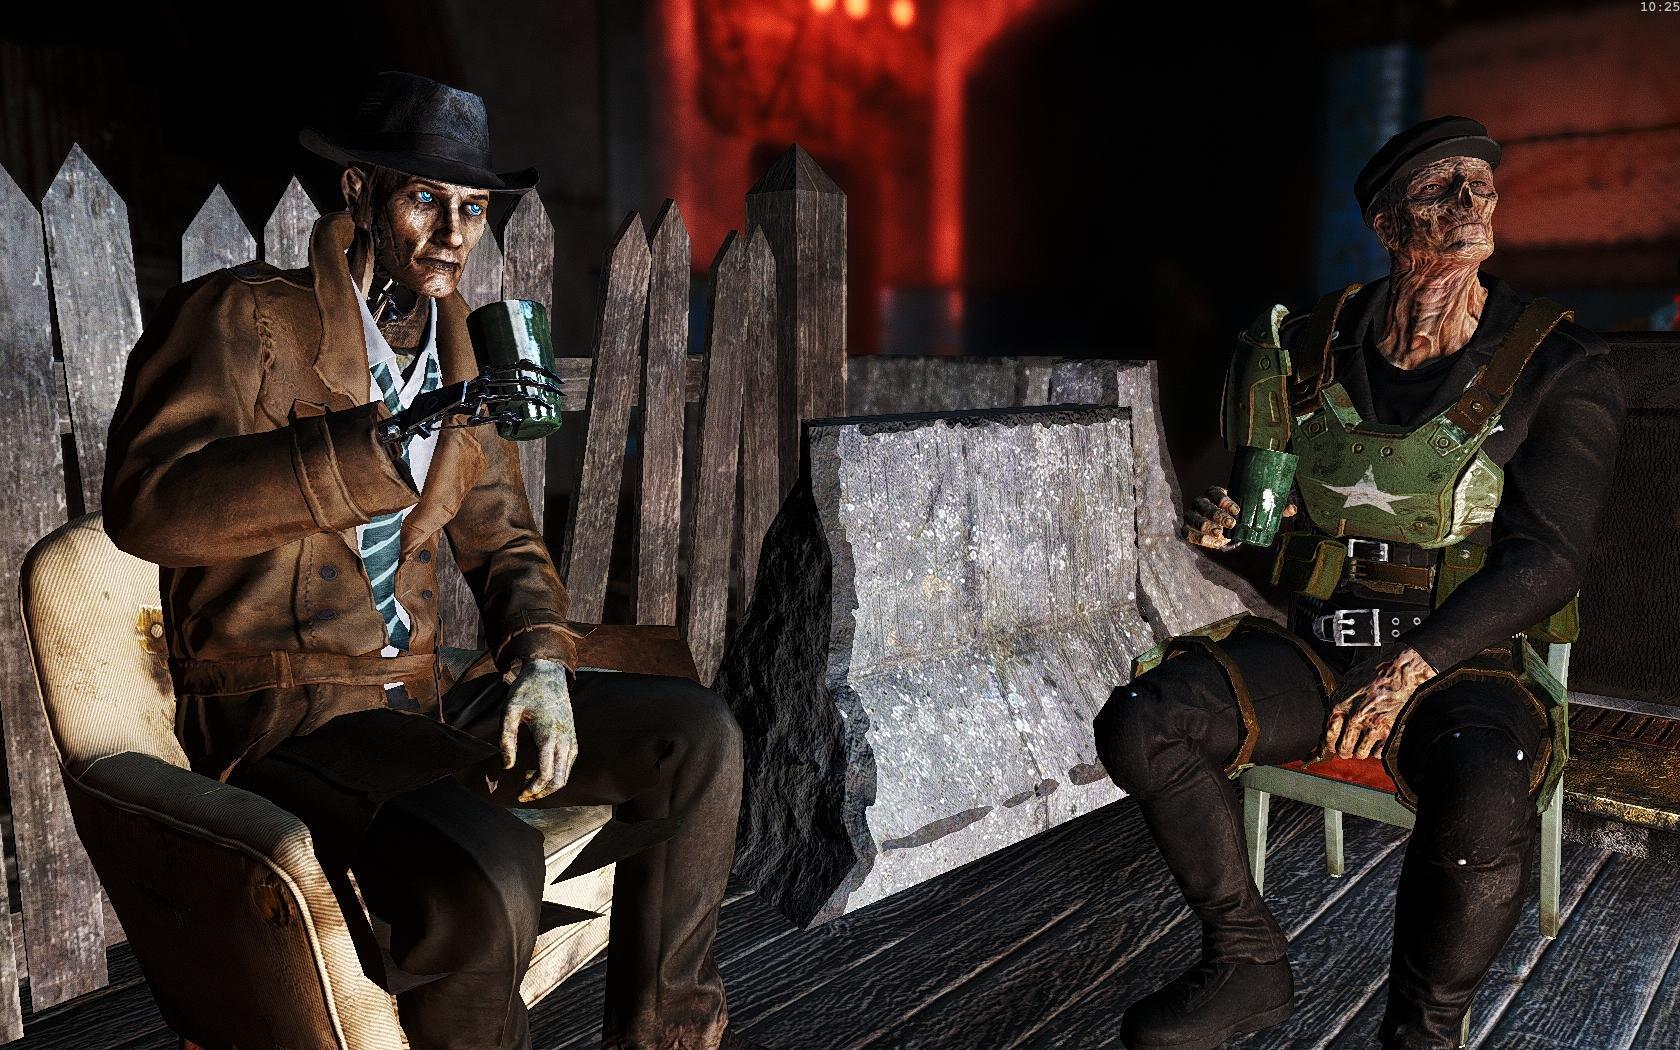 Fallout4 2019-03-25 10-25-54-67